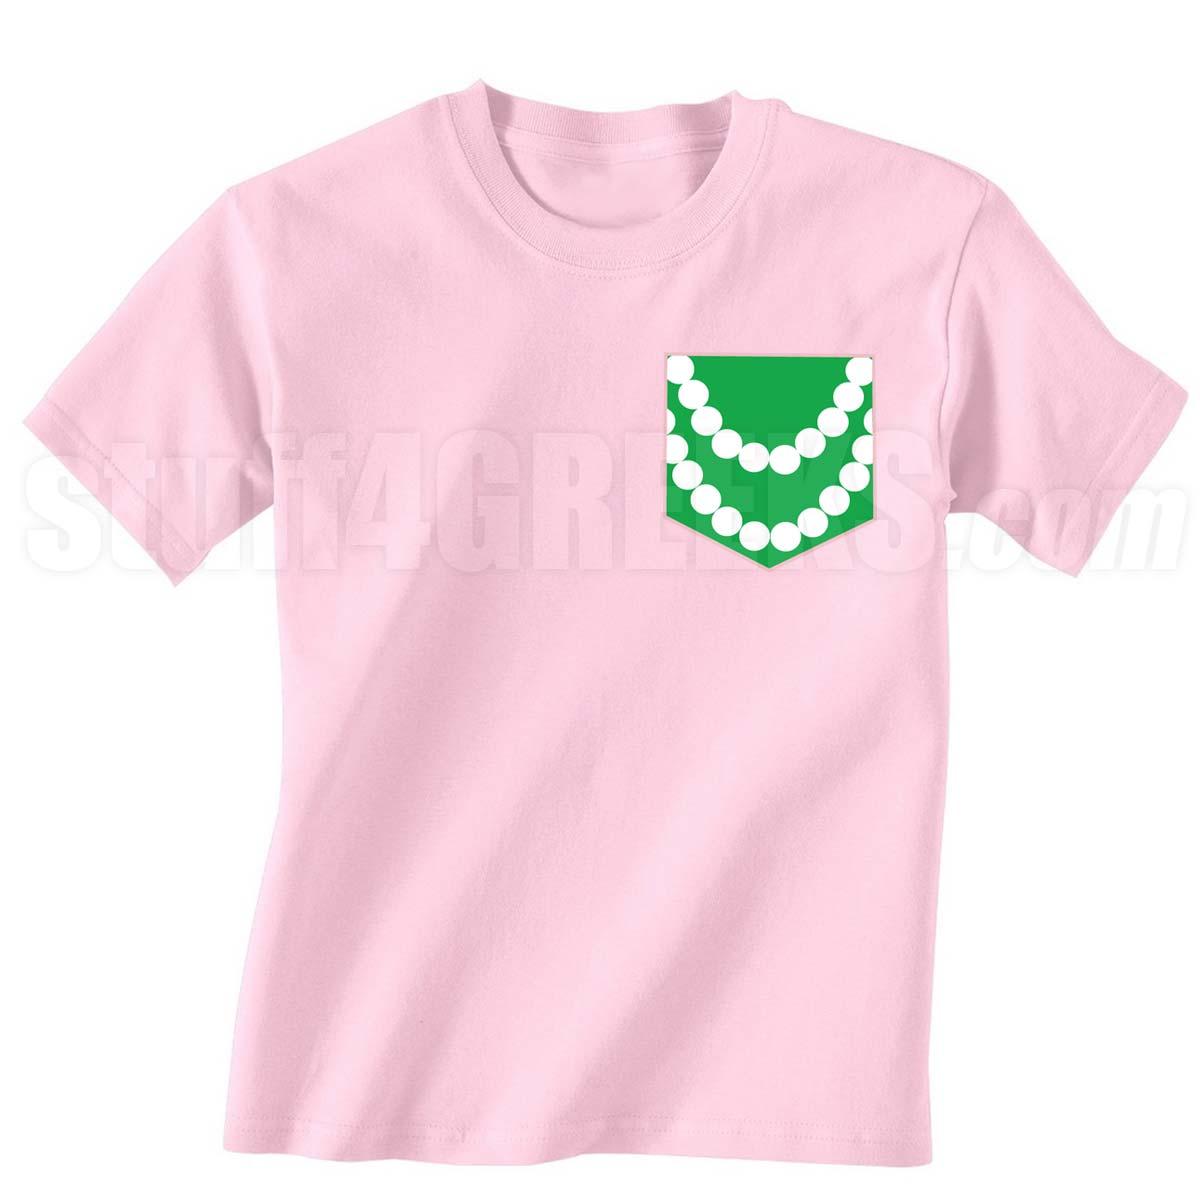 Aka Pearl Necklace Faux Pocket Screen Printed T Shirt